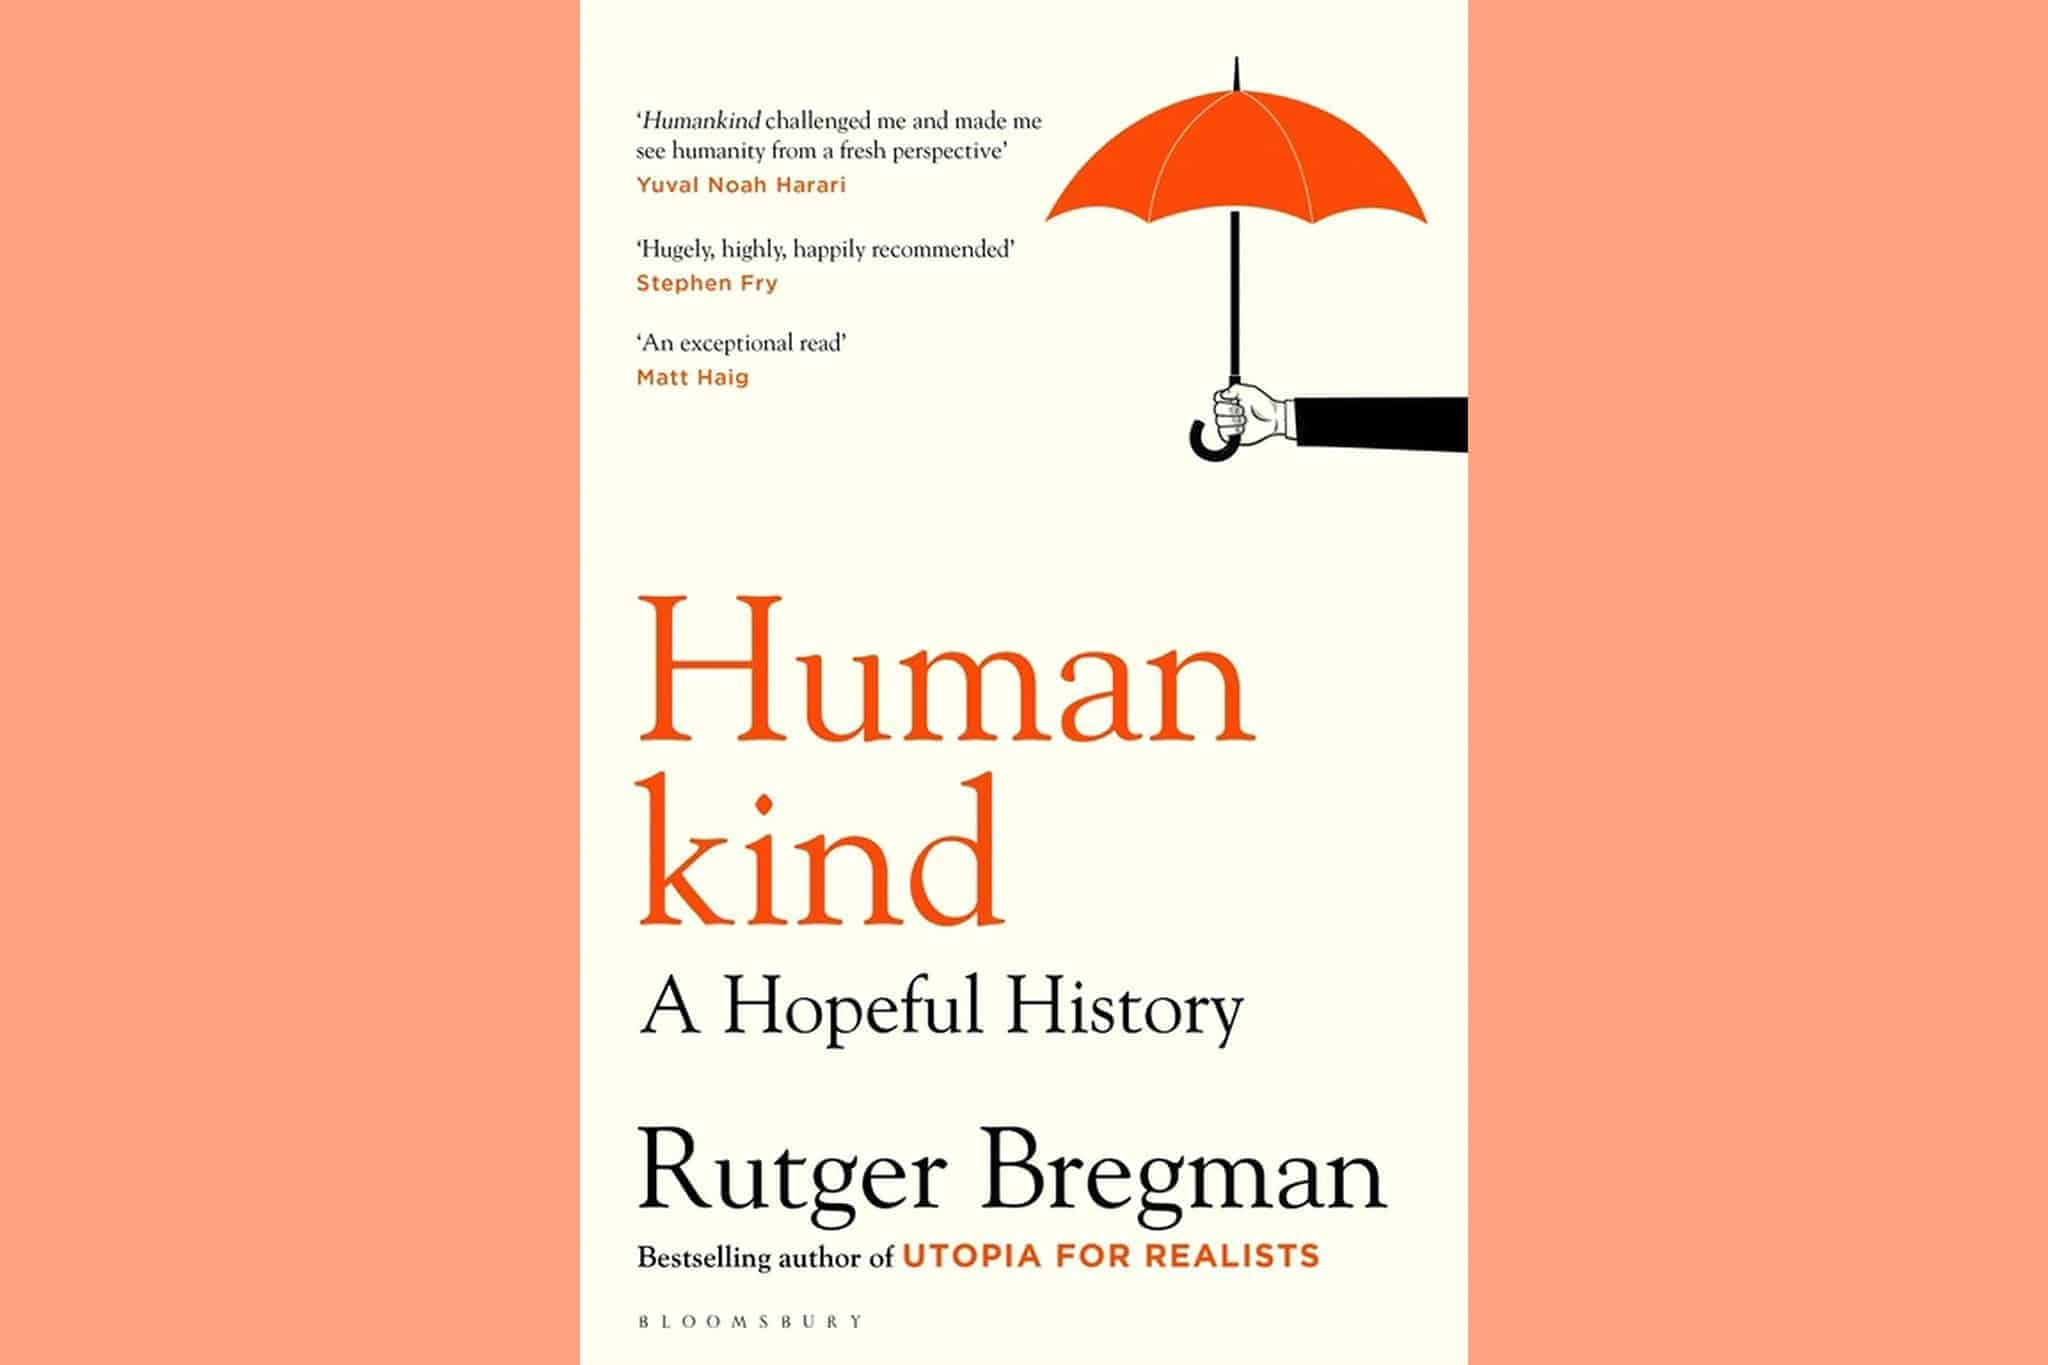 Humankind A Hopeful History By Rutger Bregman